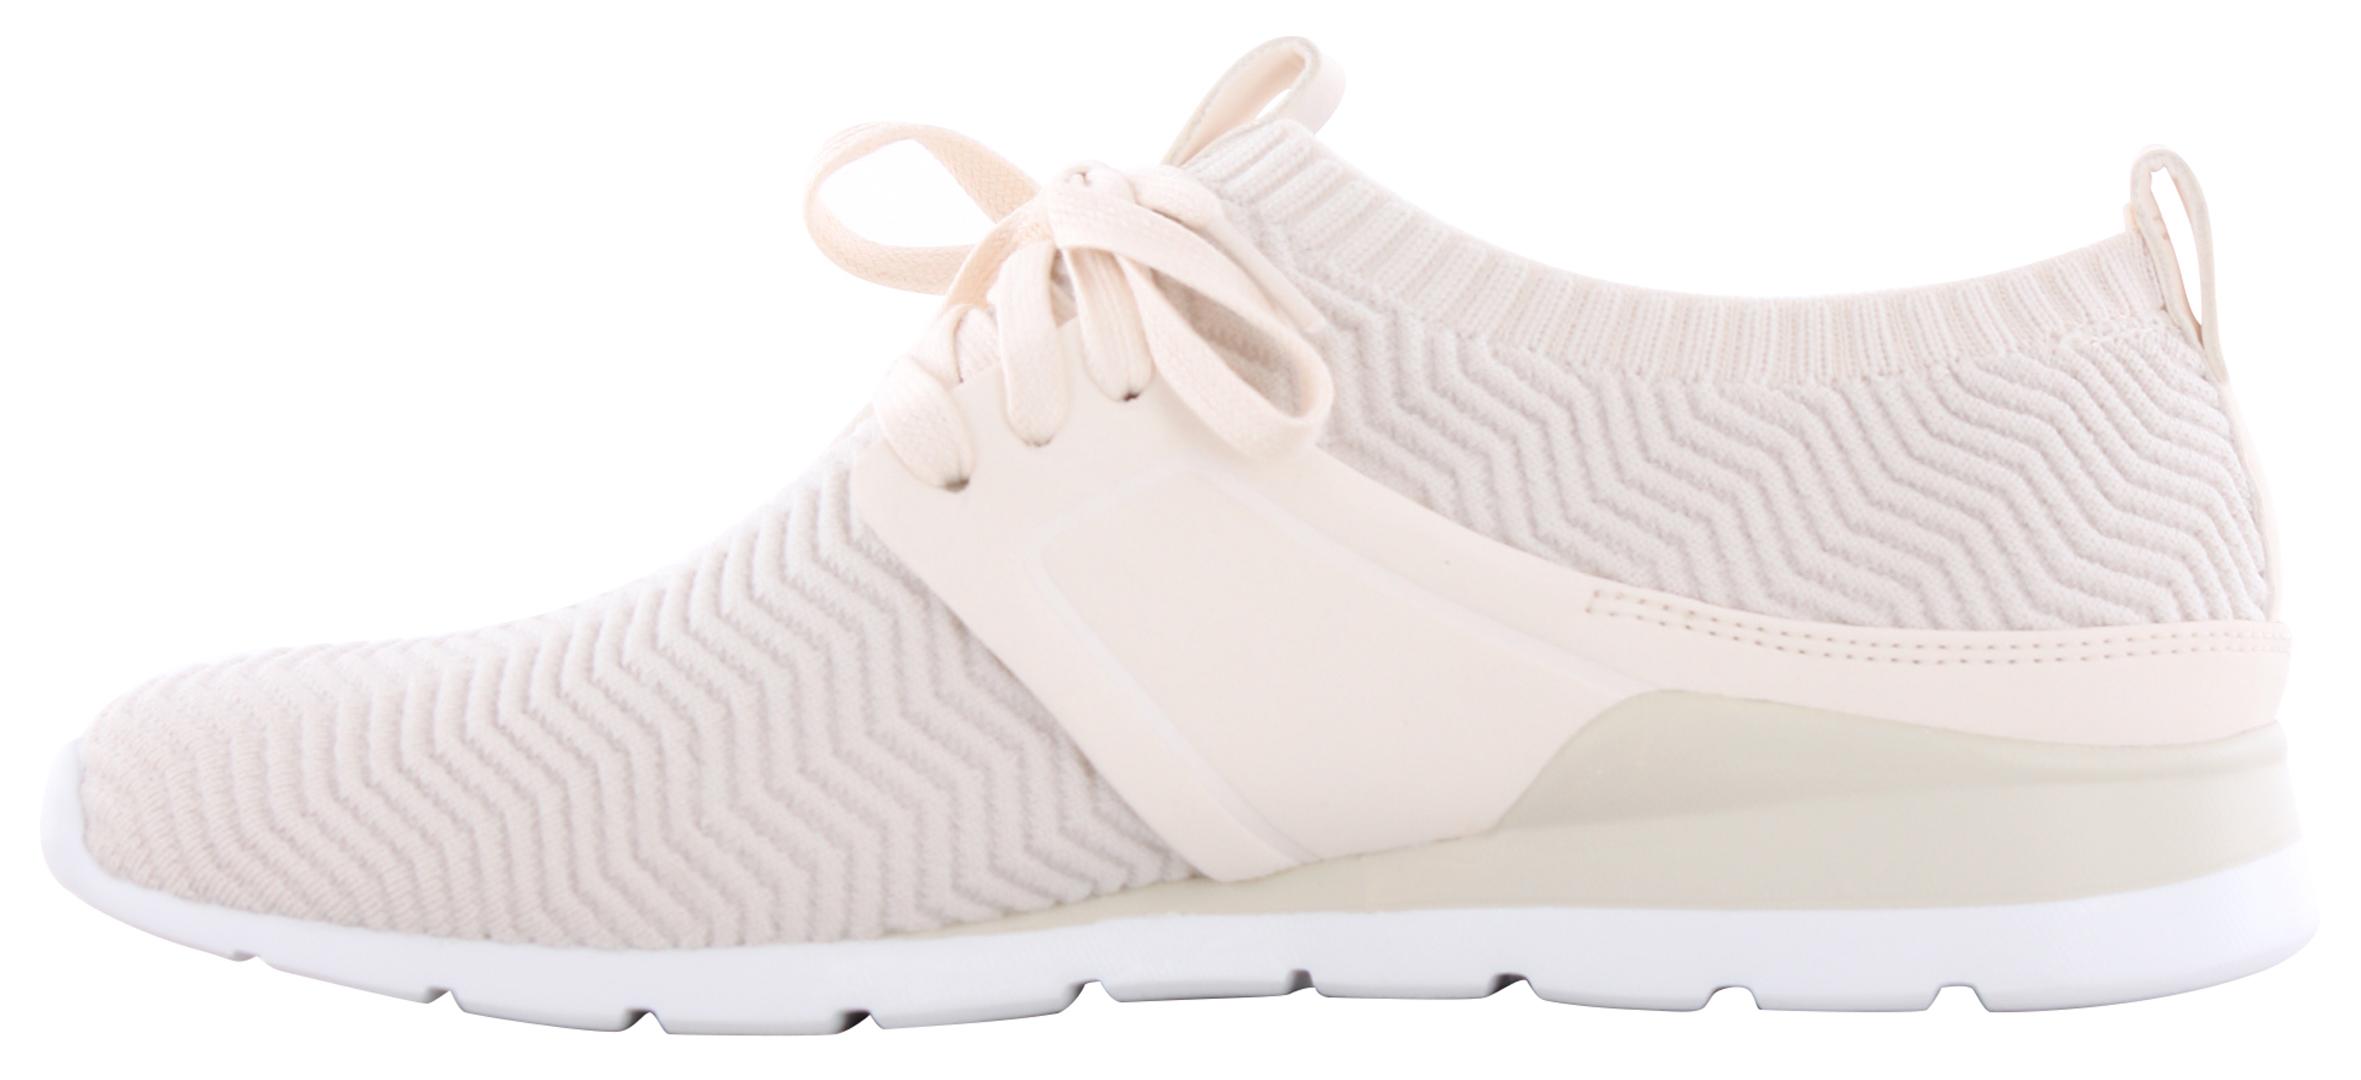 Ugg WILLOWS Sneaker 2019 jasmine | Warehouse One